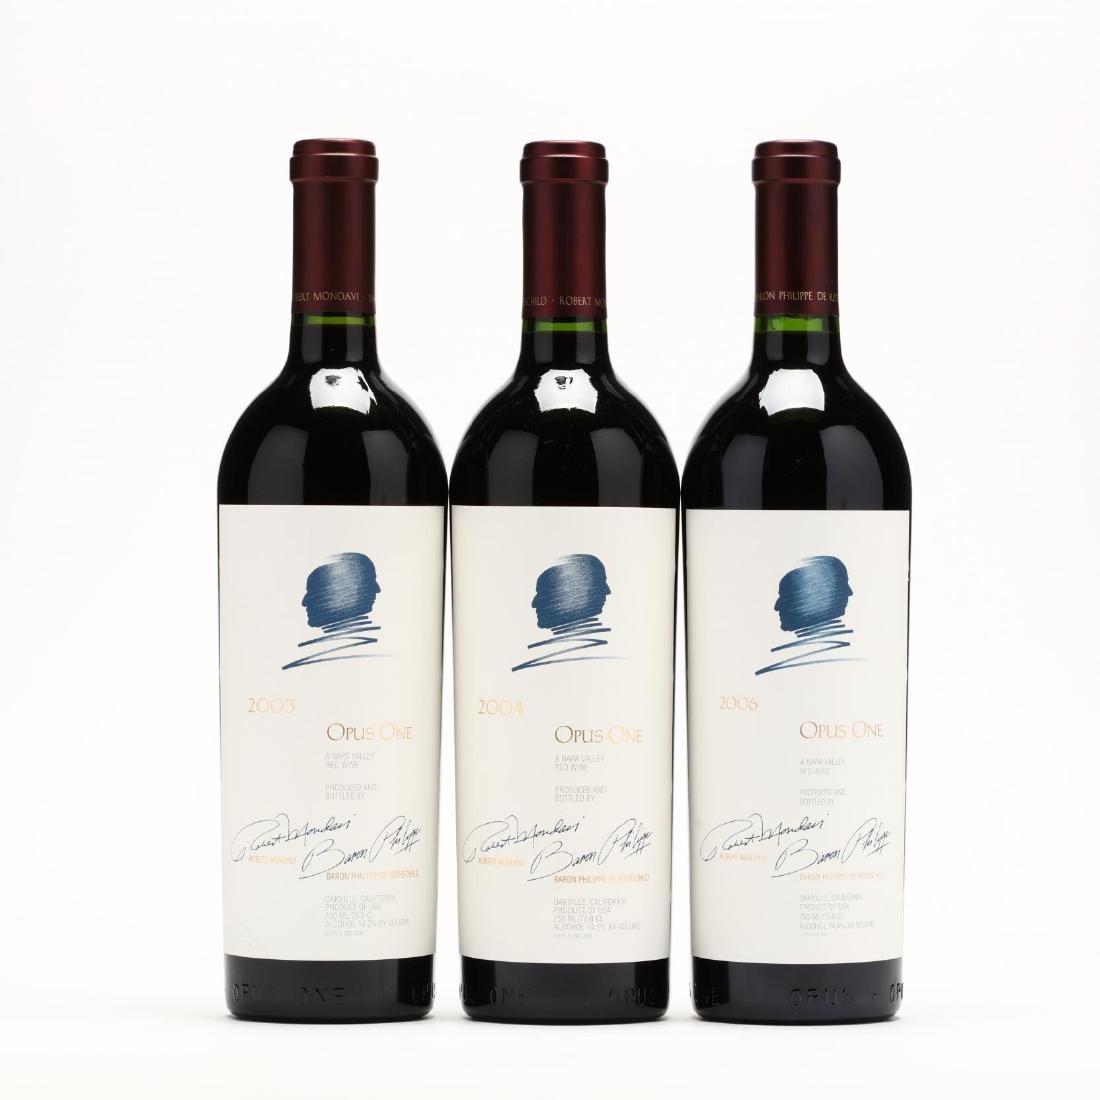 2003, 2004 & 2006 Opus One